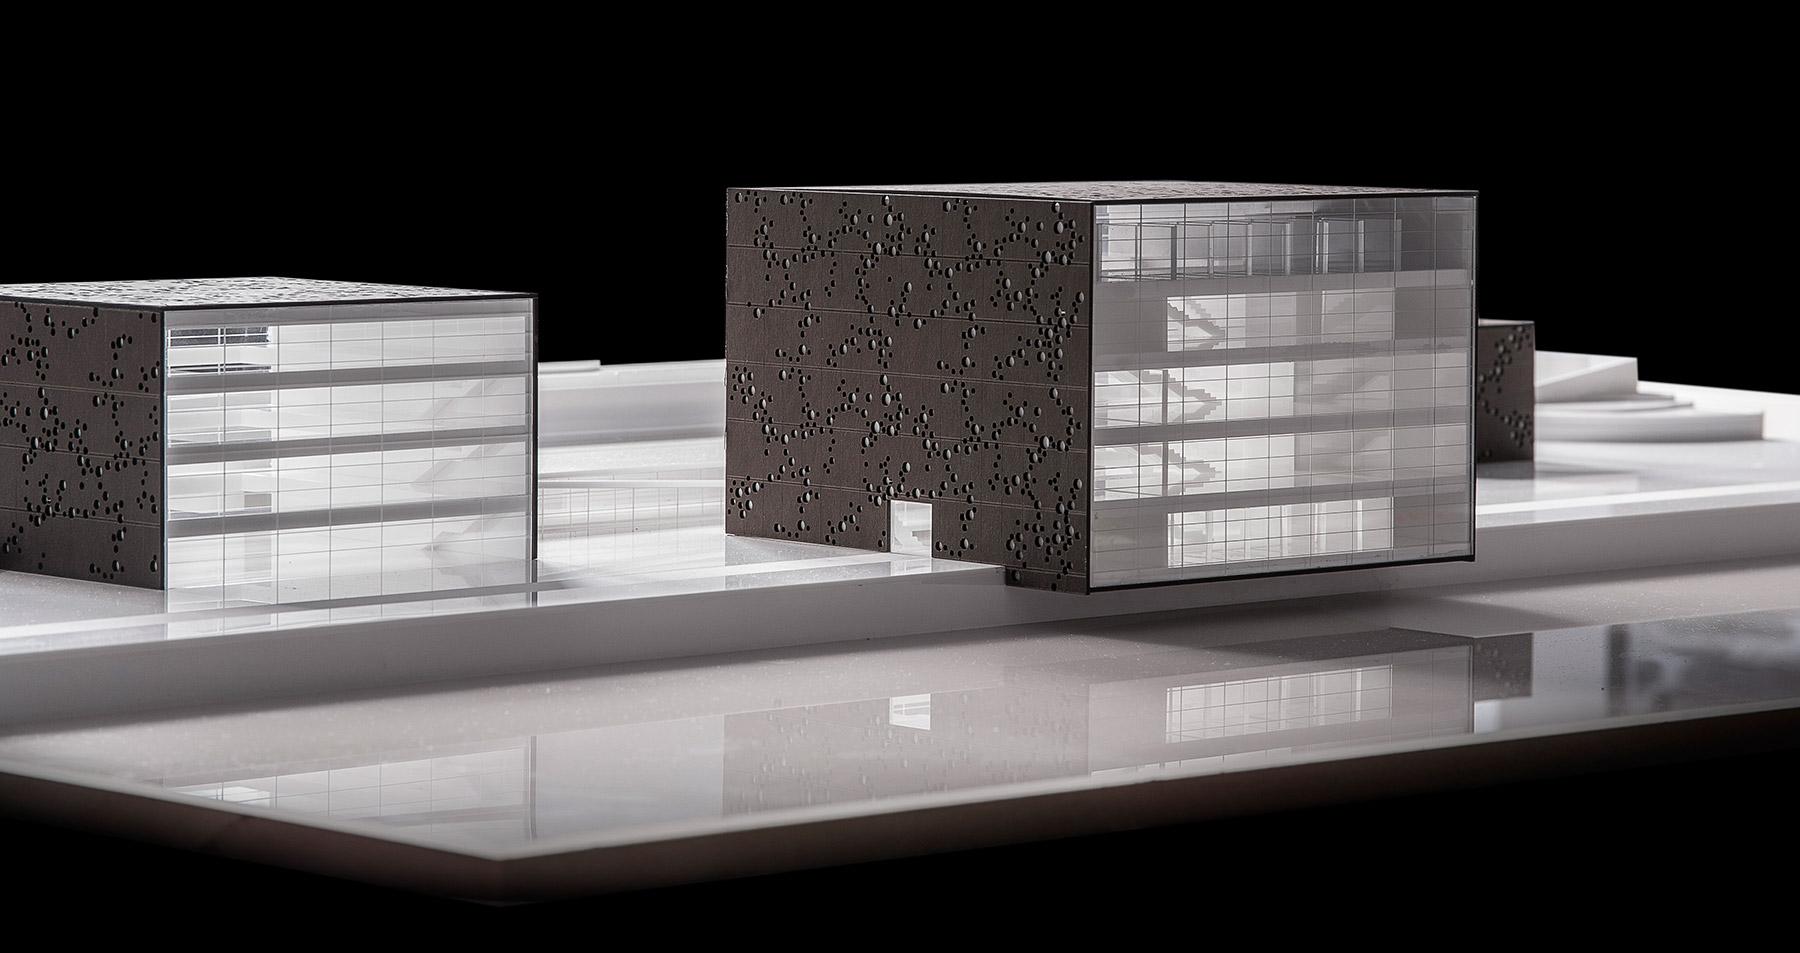 maqueta-arquitectura-architecture model-pfc-CEU-Museo-Fluvial-arquimaqueta-(6)